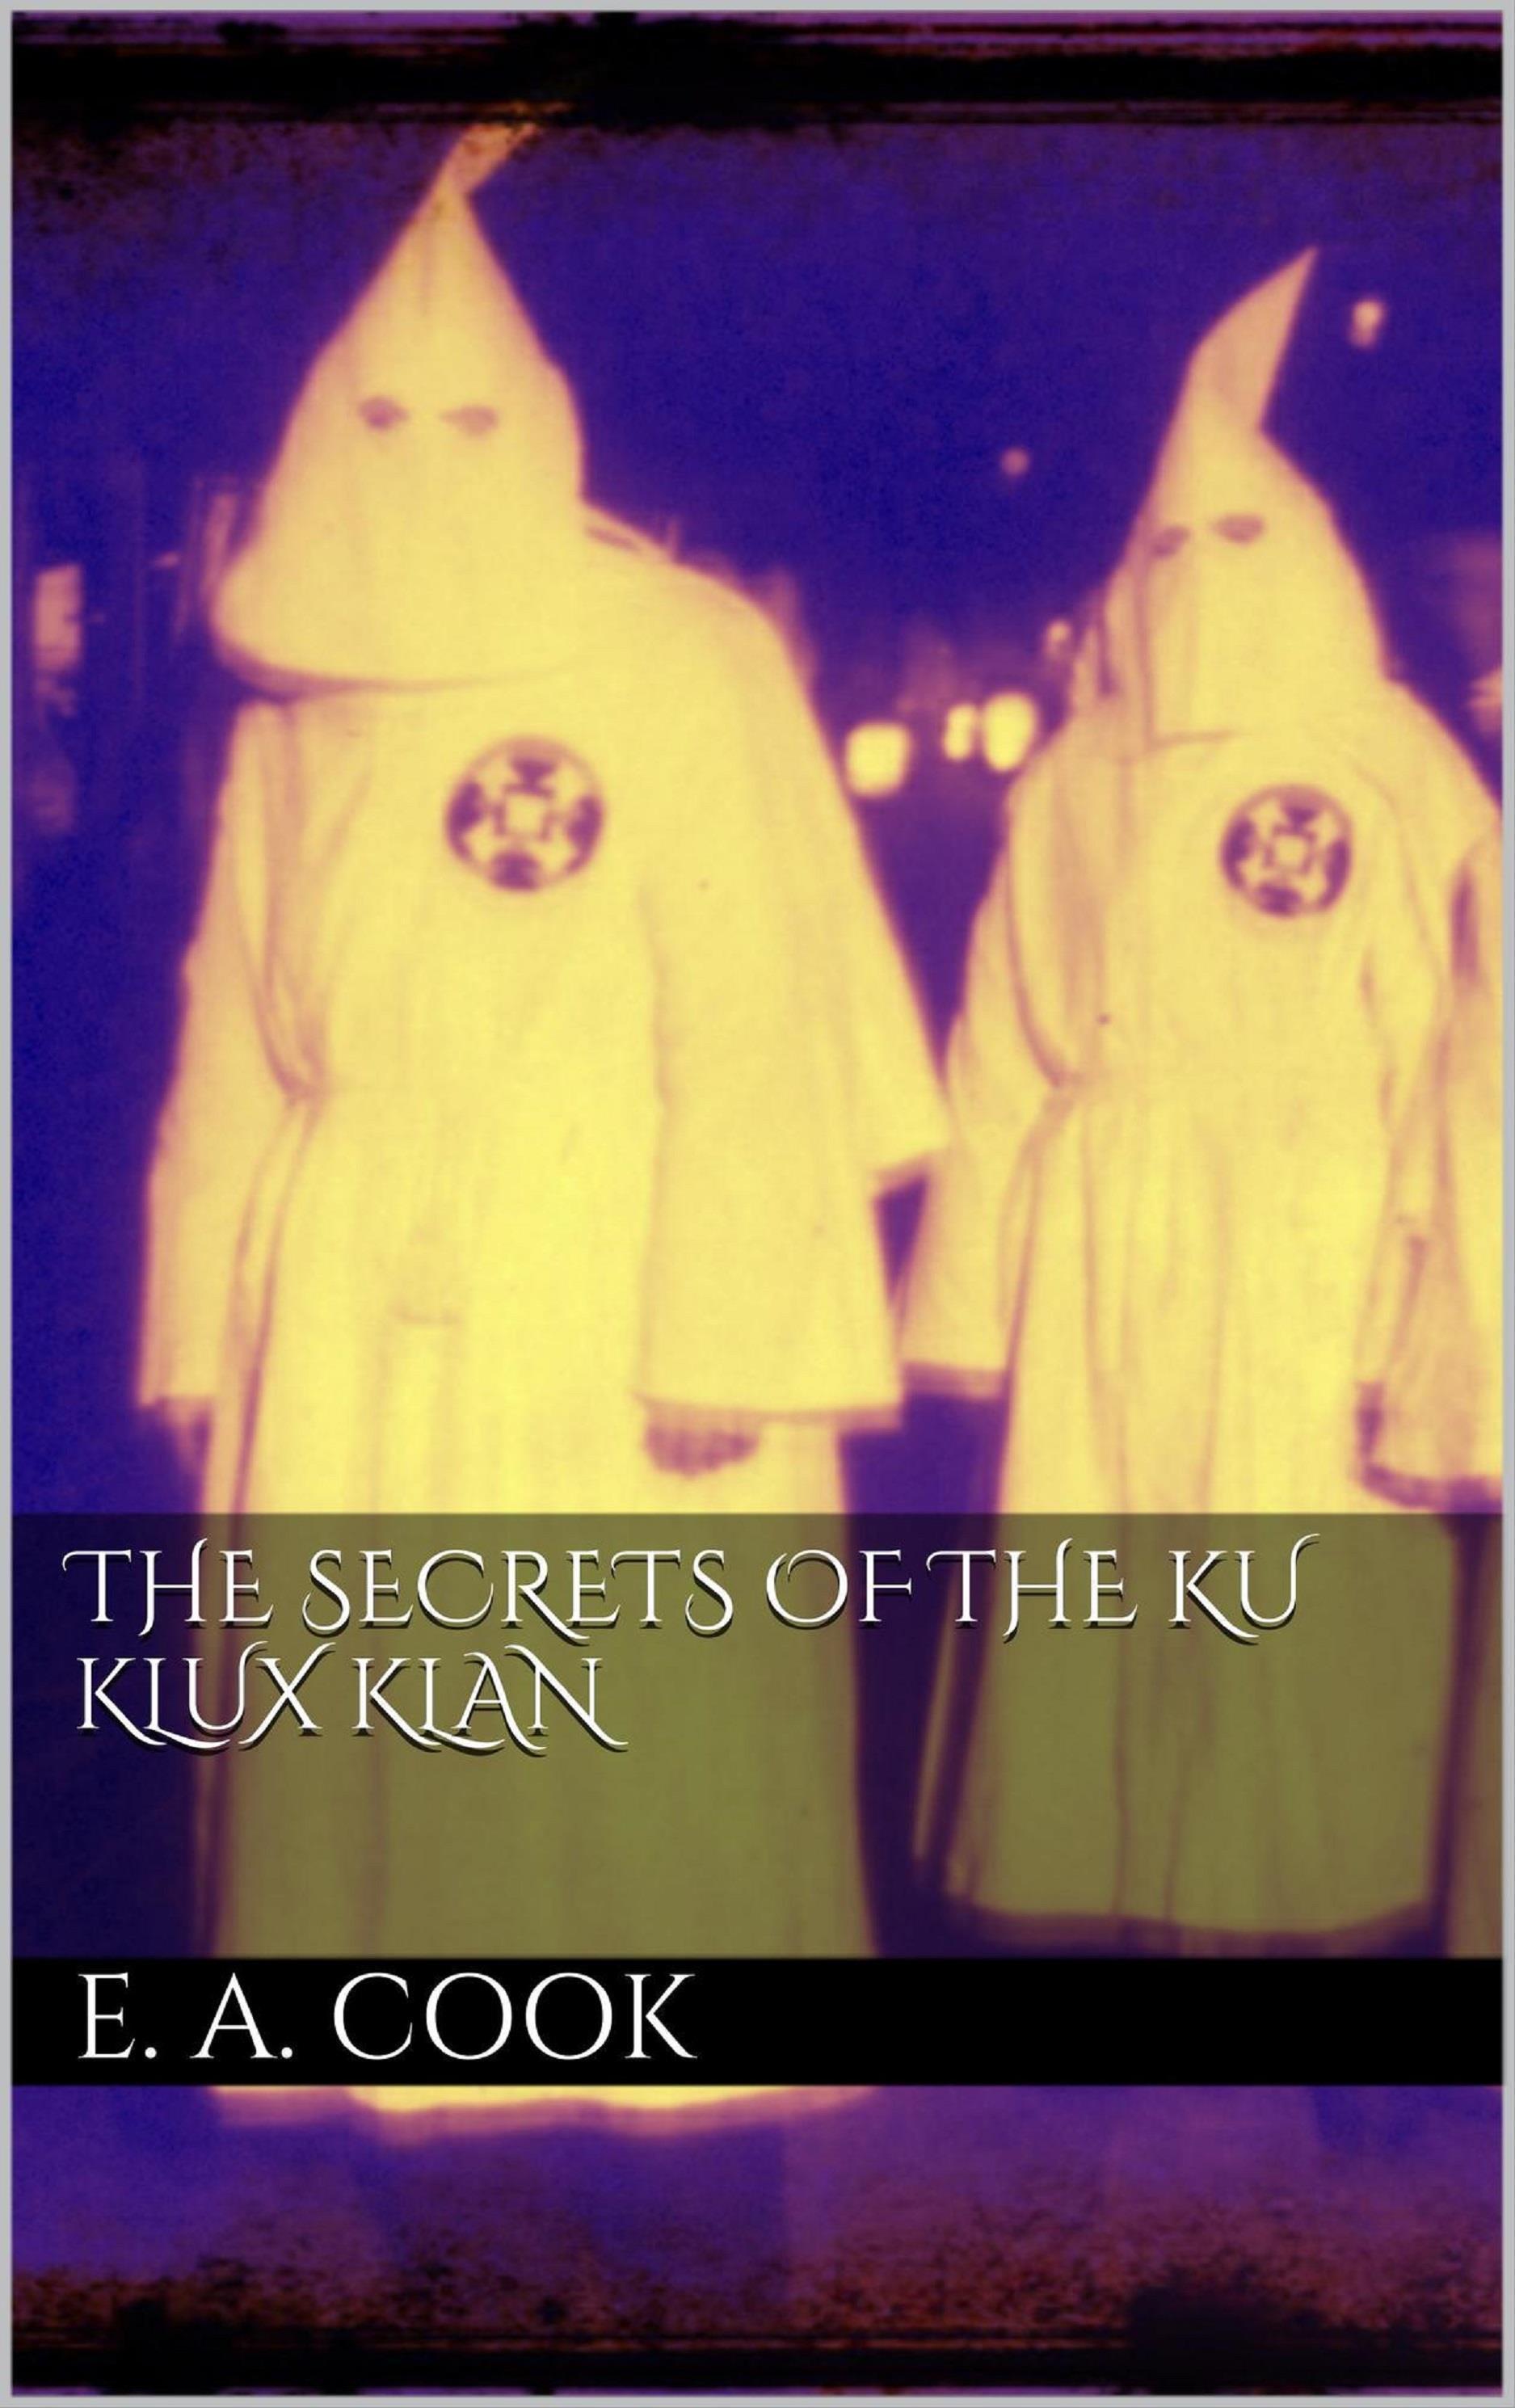 The Secrets of the Ku Klux Klan